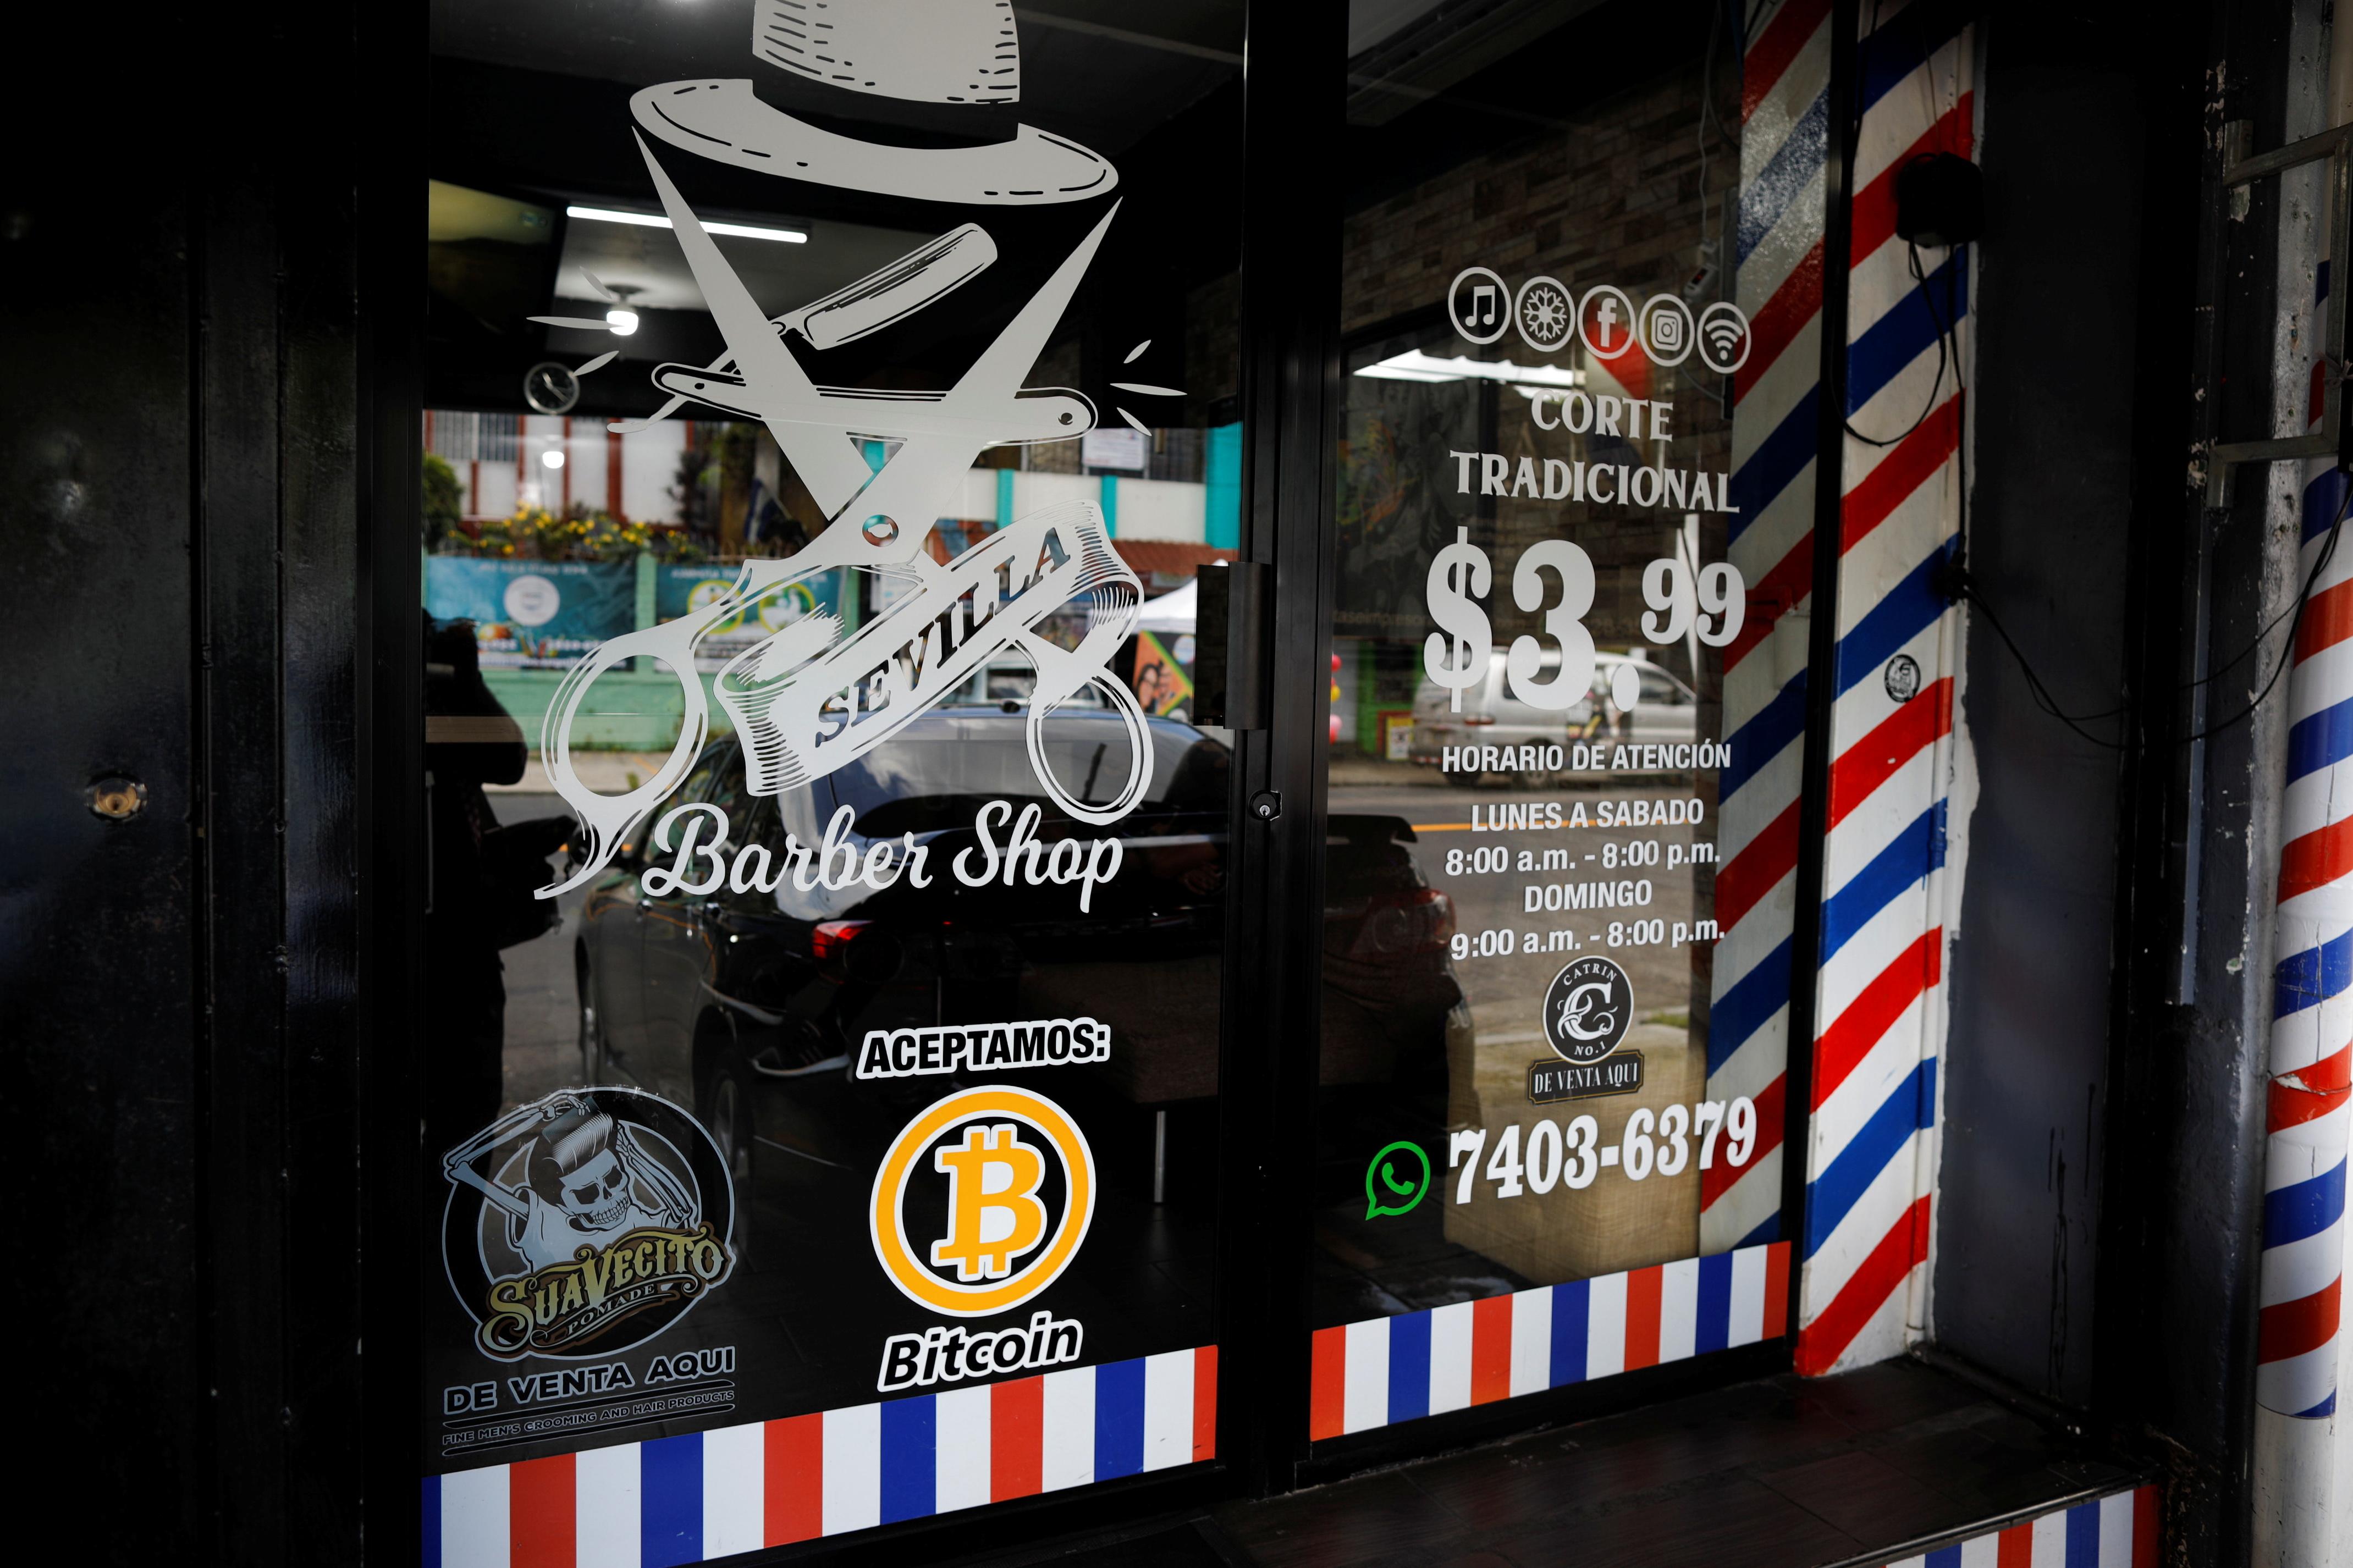 A Bitcoin logo is seen outside at Sevilla Barber Shop where Bitcoin is accepted as a payment method in Santa Tecla, El Salvador September 6, 2021. REUTERS/Jose Cabezas